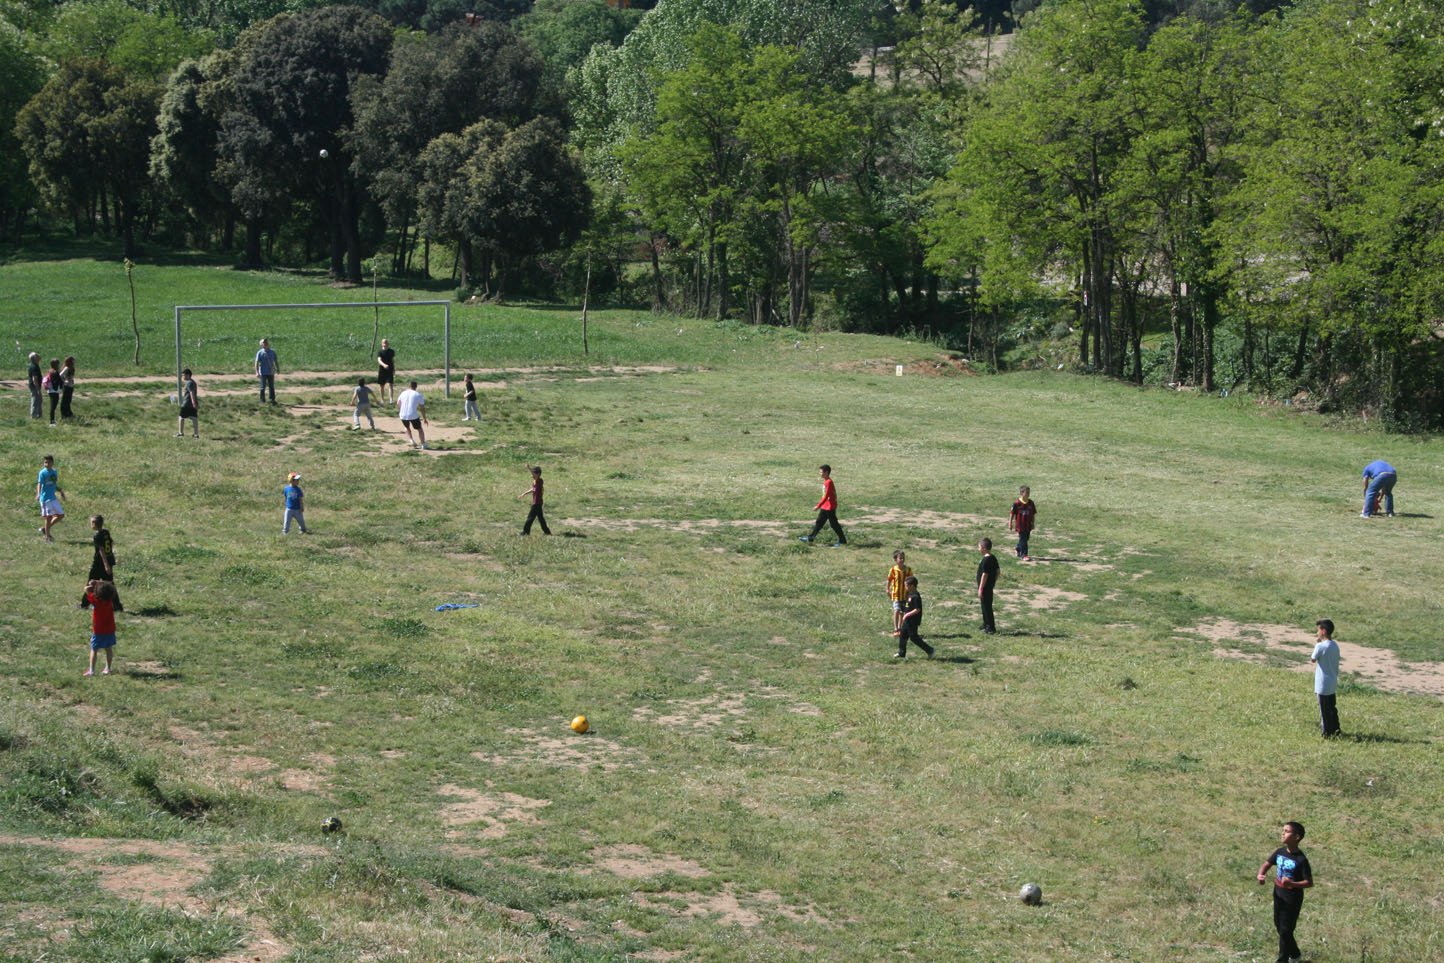 camp_futbol153b6eb79322c2.jpg